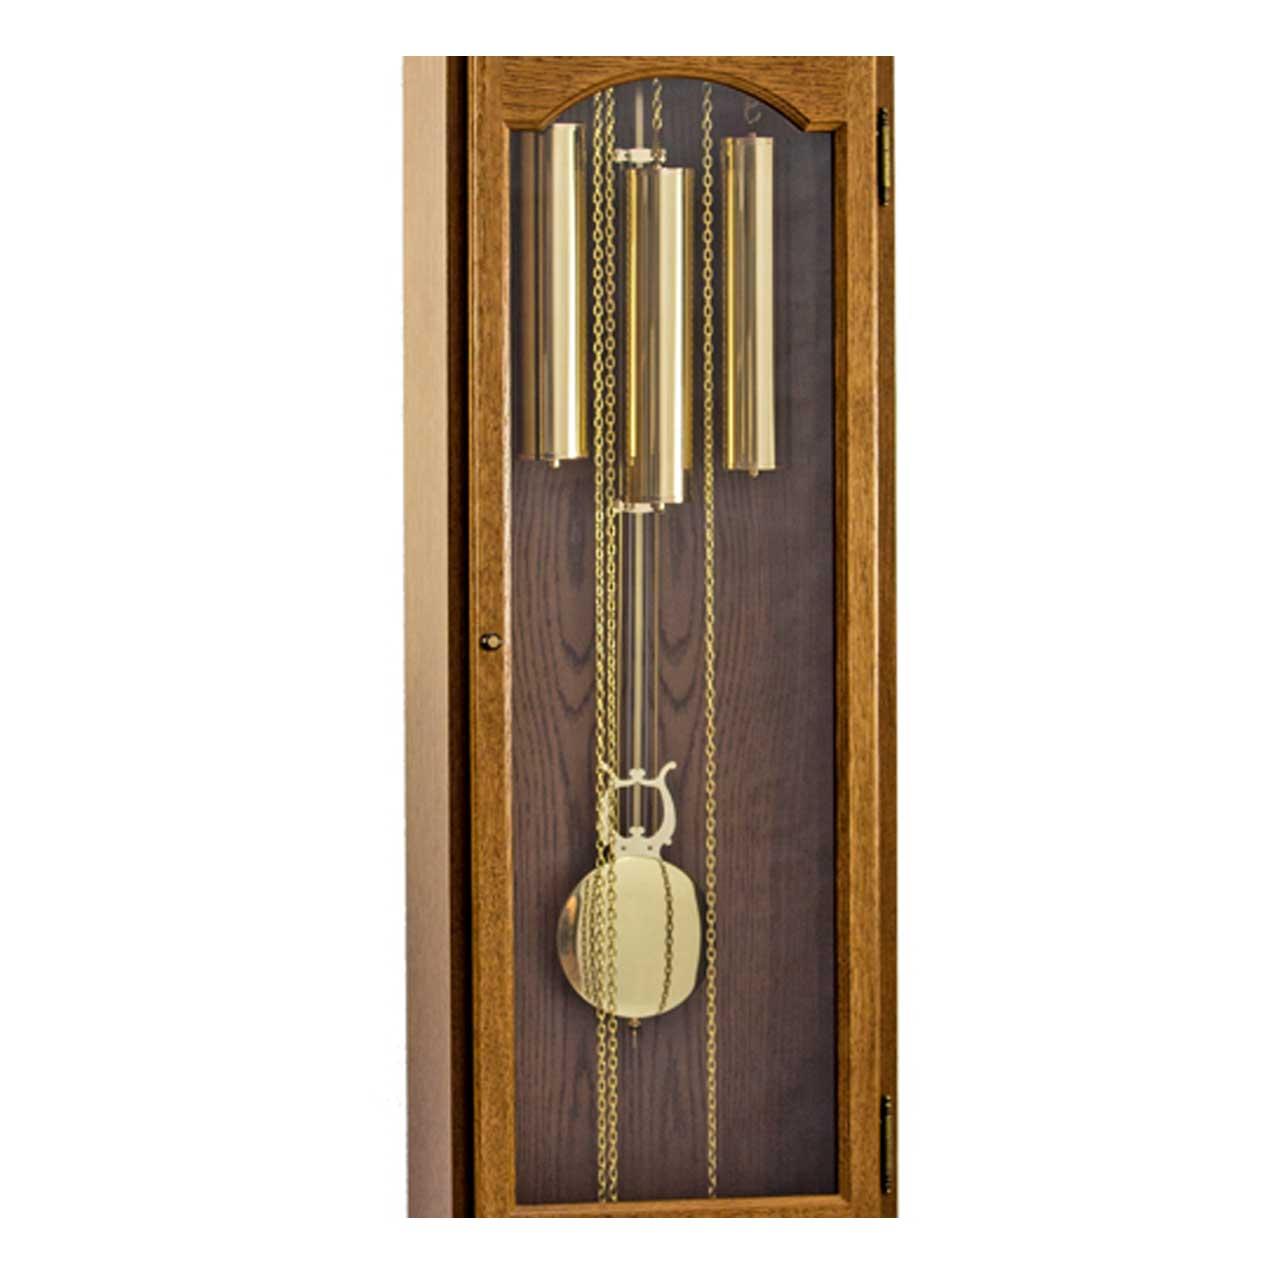 Billib Glenhaven Oak Grandmother Floor Clock